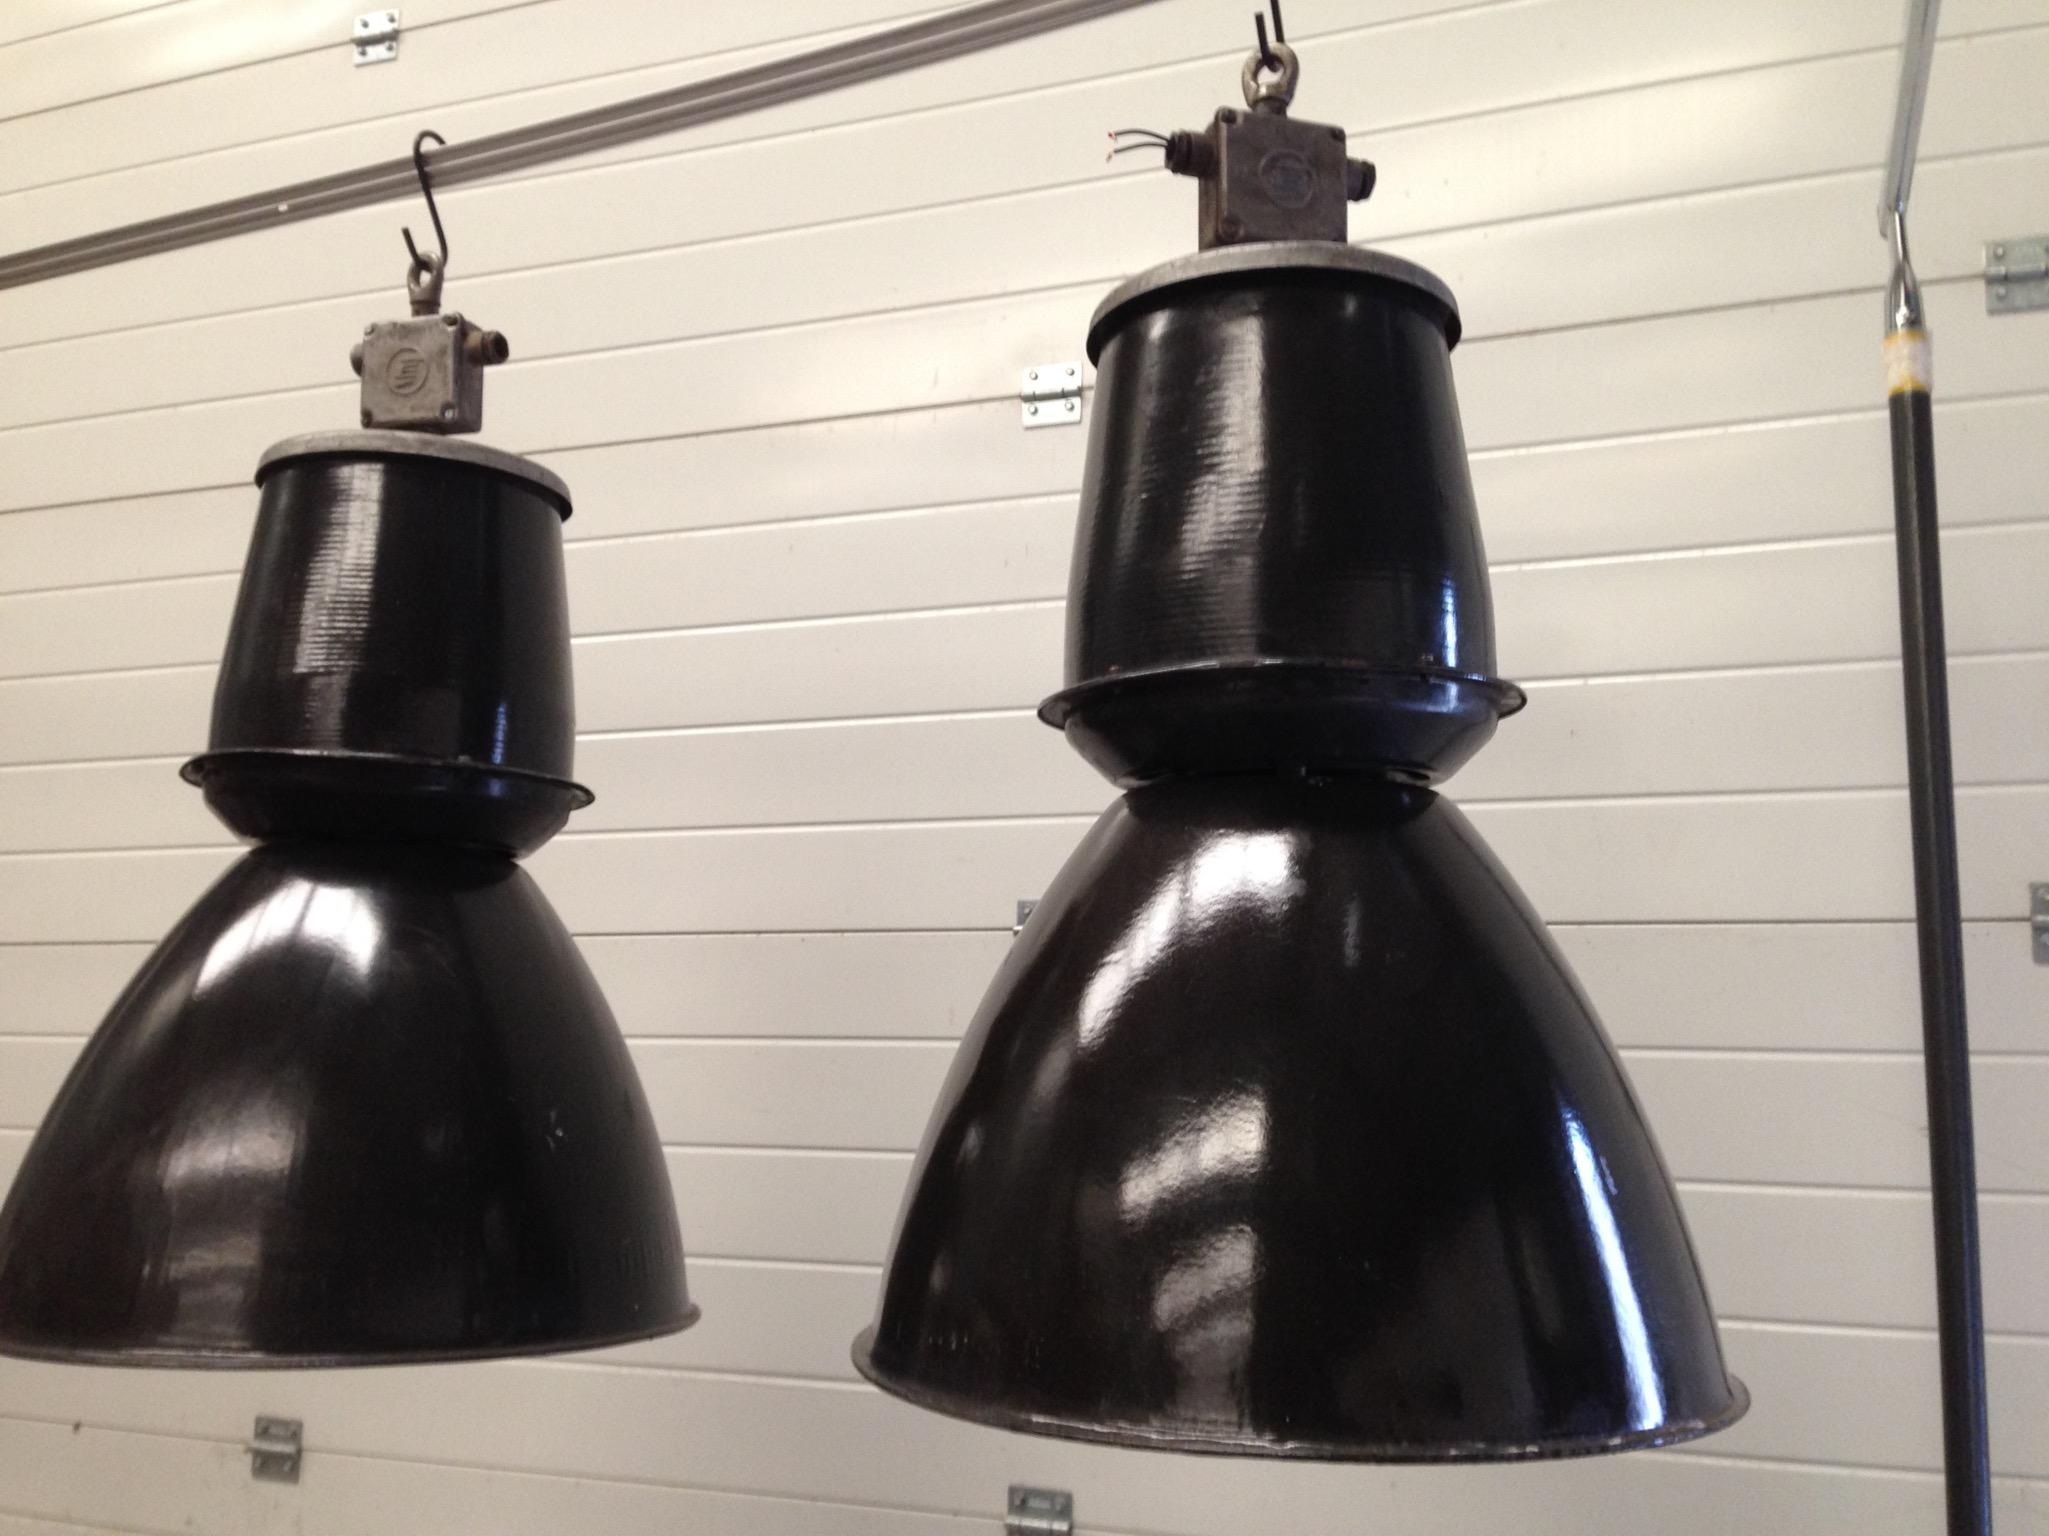 industriele lampen emaille lampen tjechie landzicht. Black Bedroom Furniture Sets. Home Design Ideas